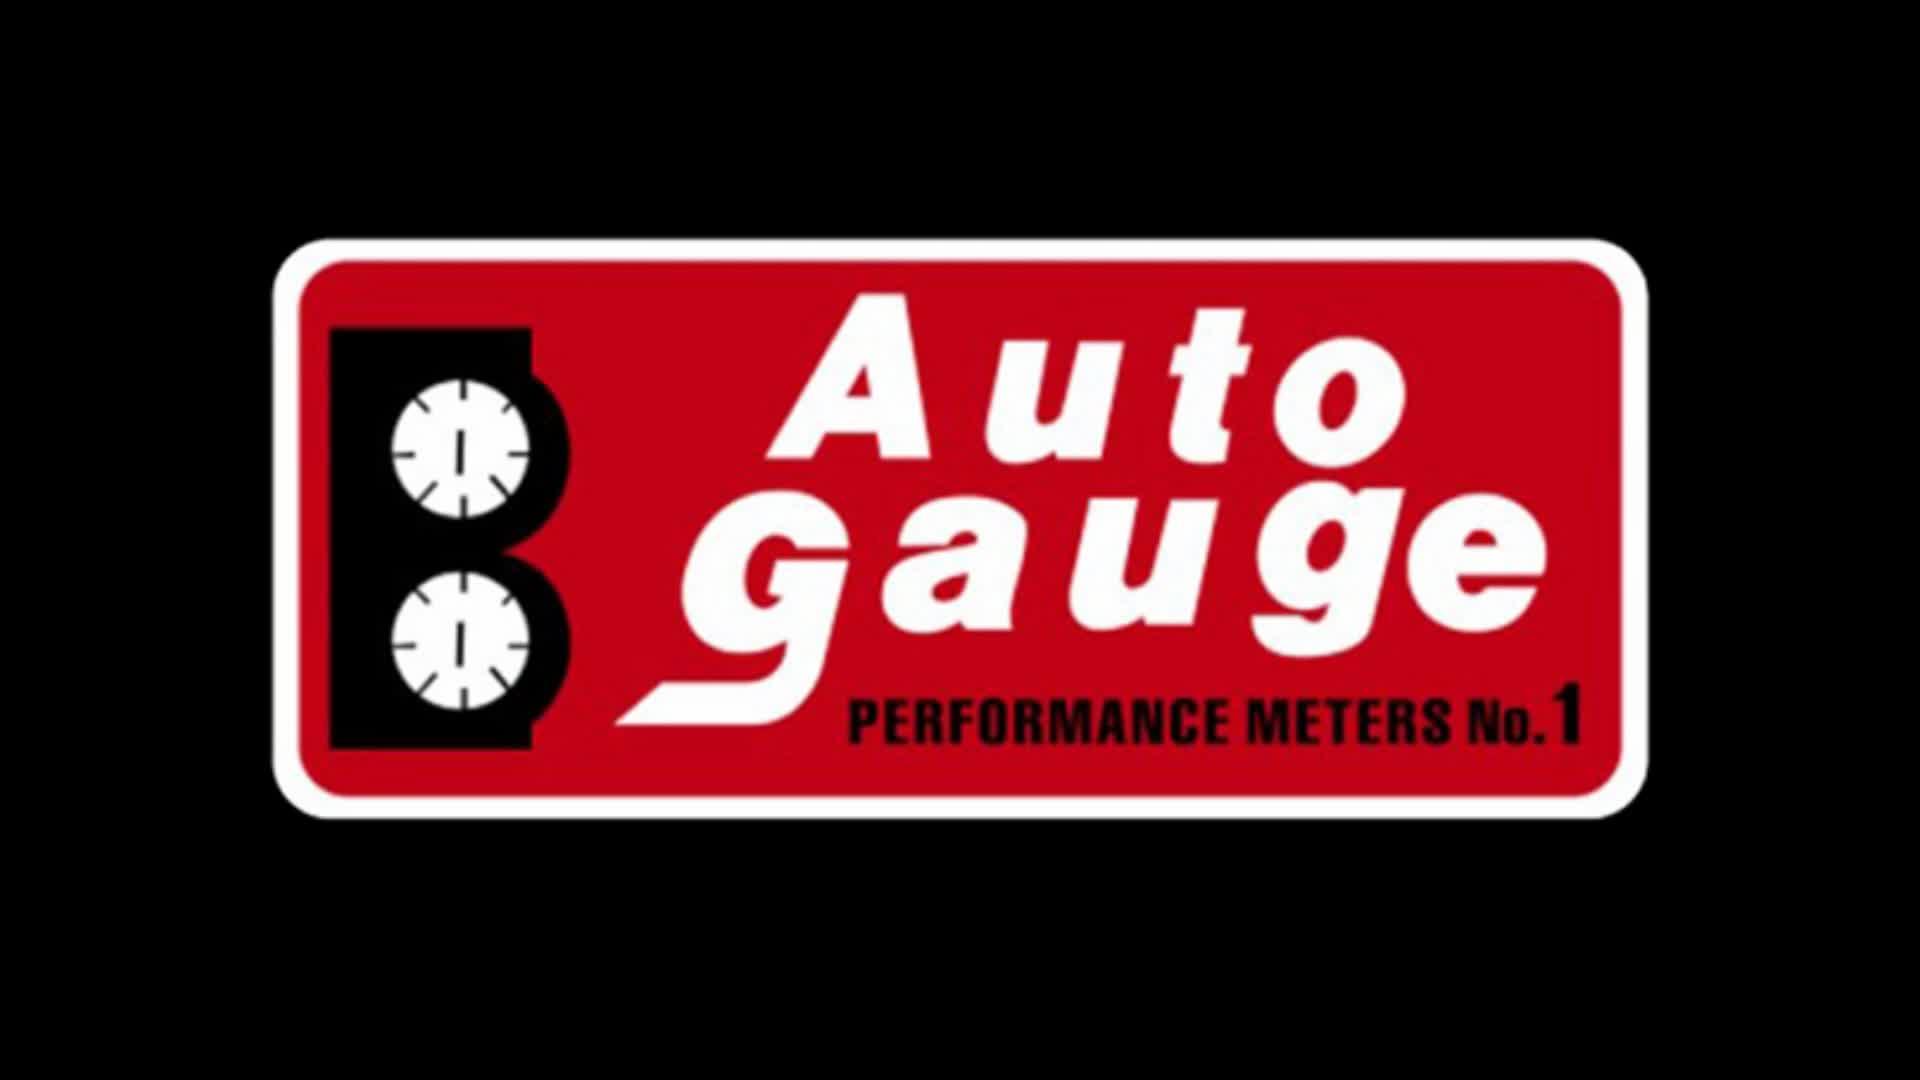 Digital mechanical hour meter for generator